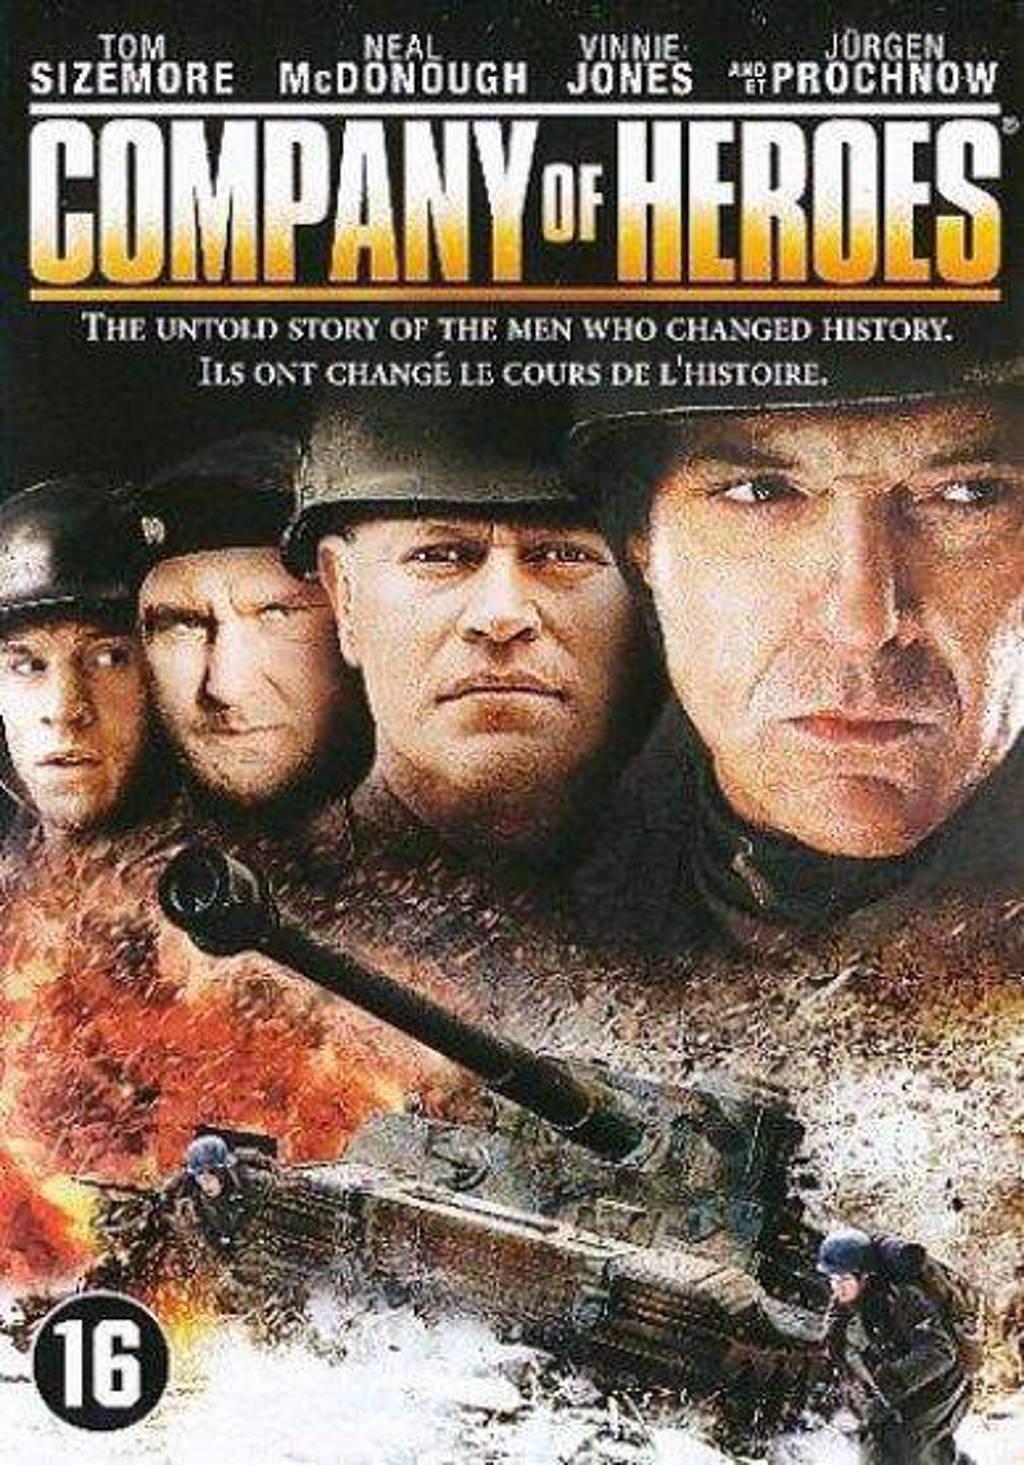 Company of heroes (DVD)